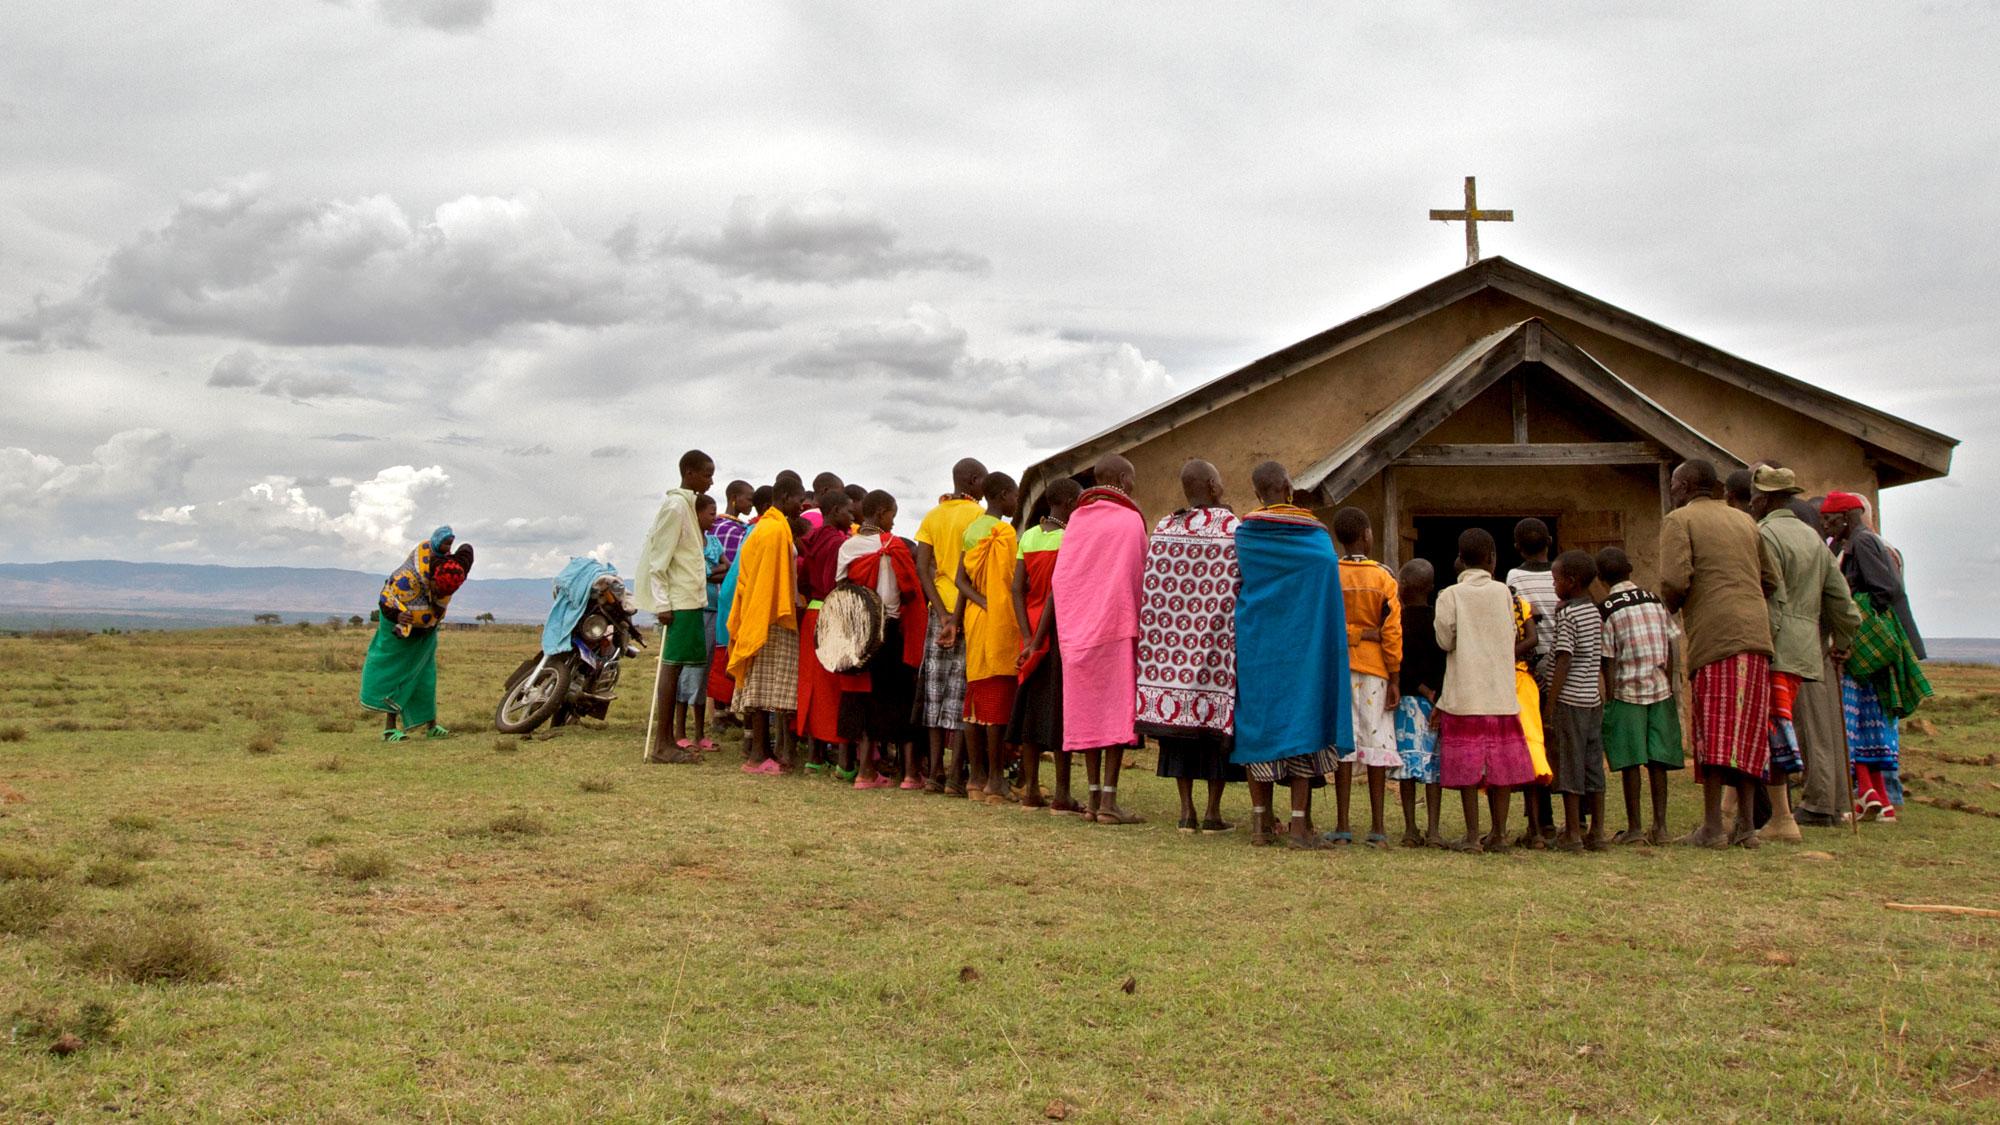 Un villaggio della Tanzania (Foto: Al Jazeera)